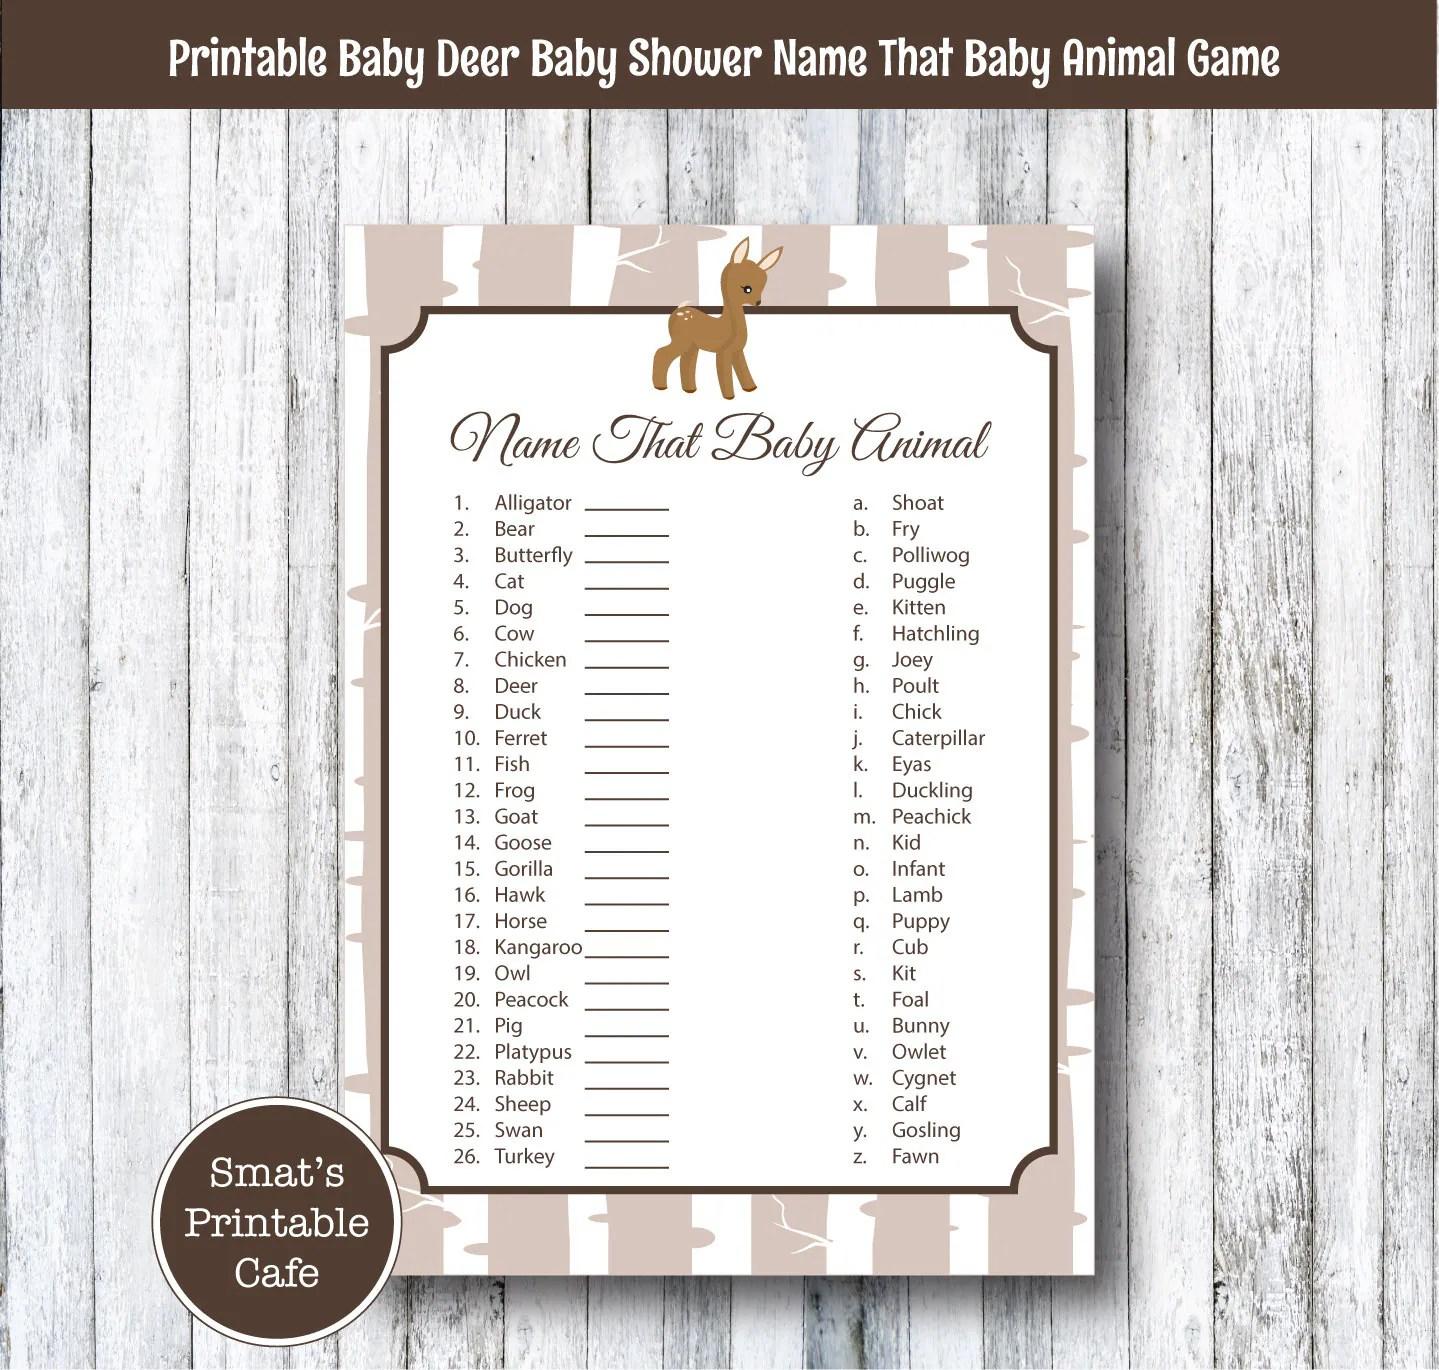 Baby Deer Baby Shower Baby Animal Name Game Quiz Printable